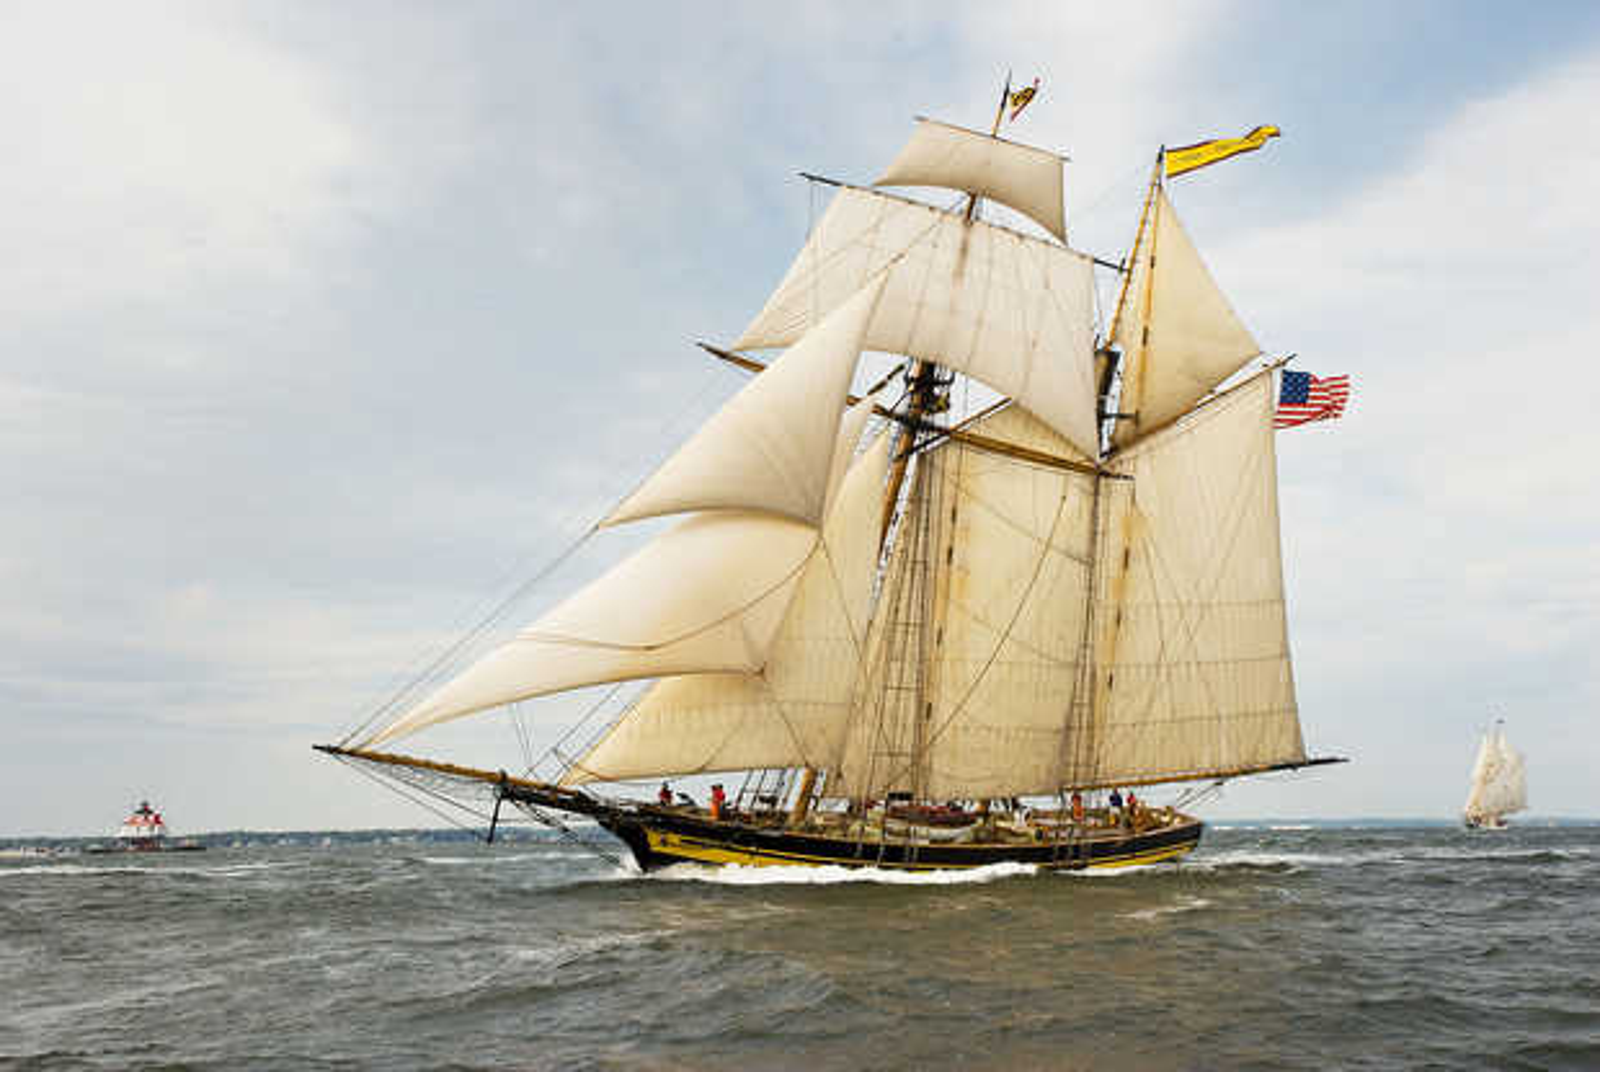 Pride of Baltimore II, Racing on the Chesapeake Bay - Greg Pease